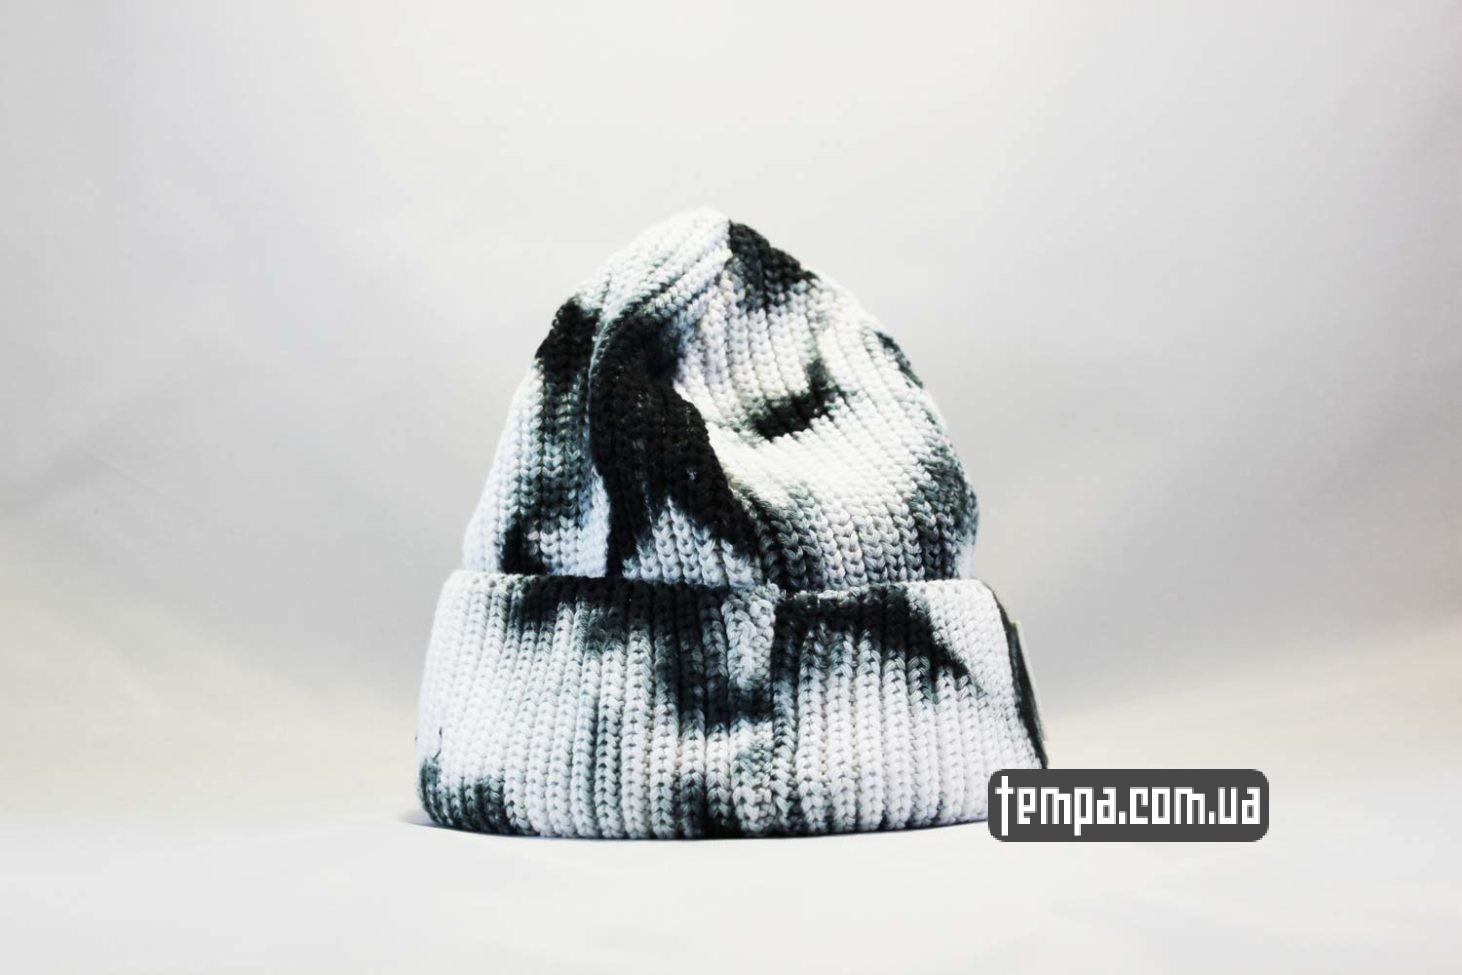 Carhartt USA шапка beanie Carhartt пятнистая черно-белая